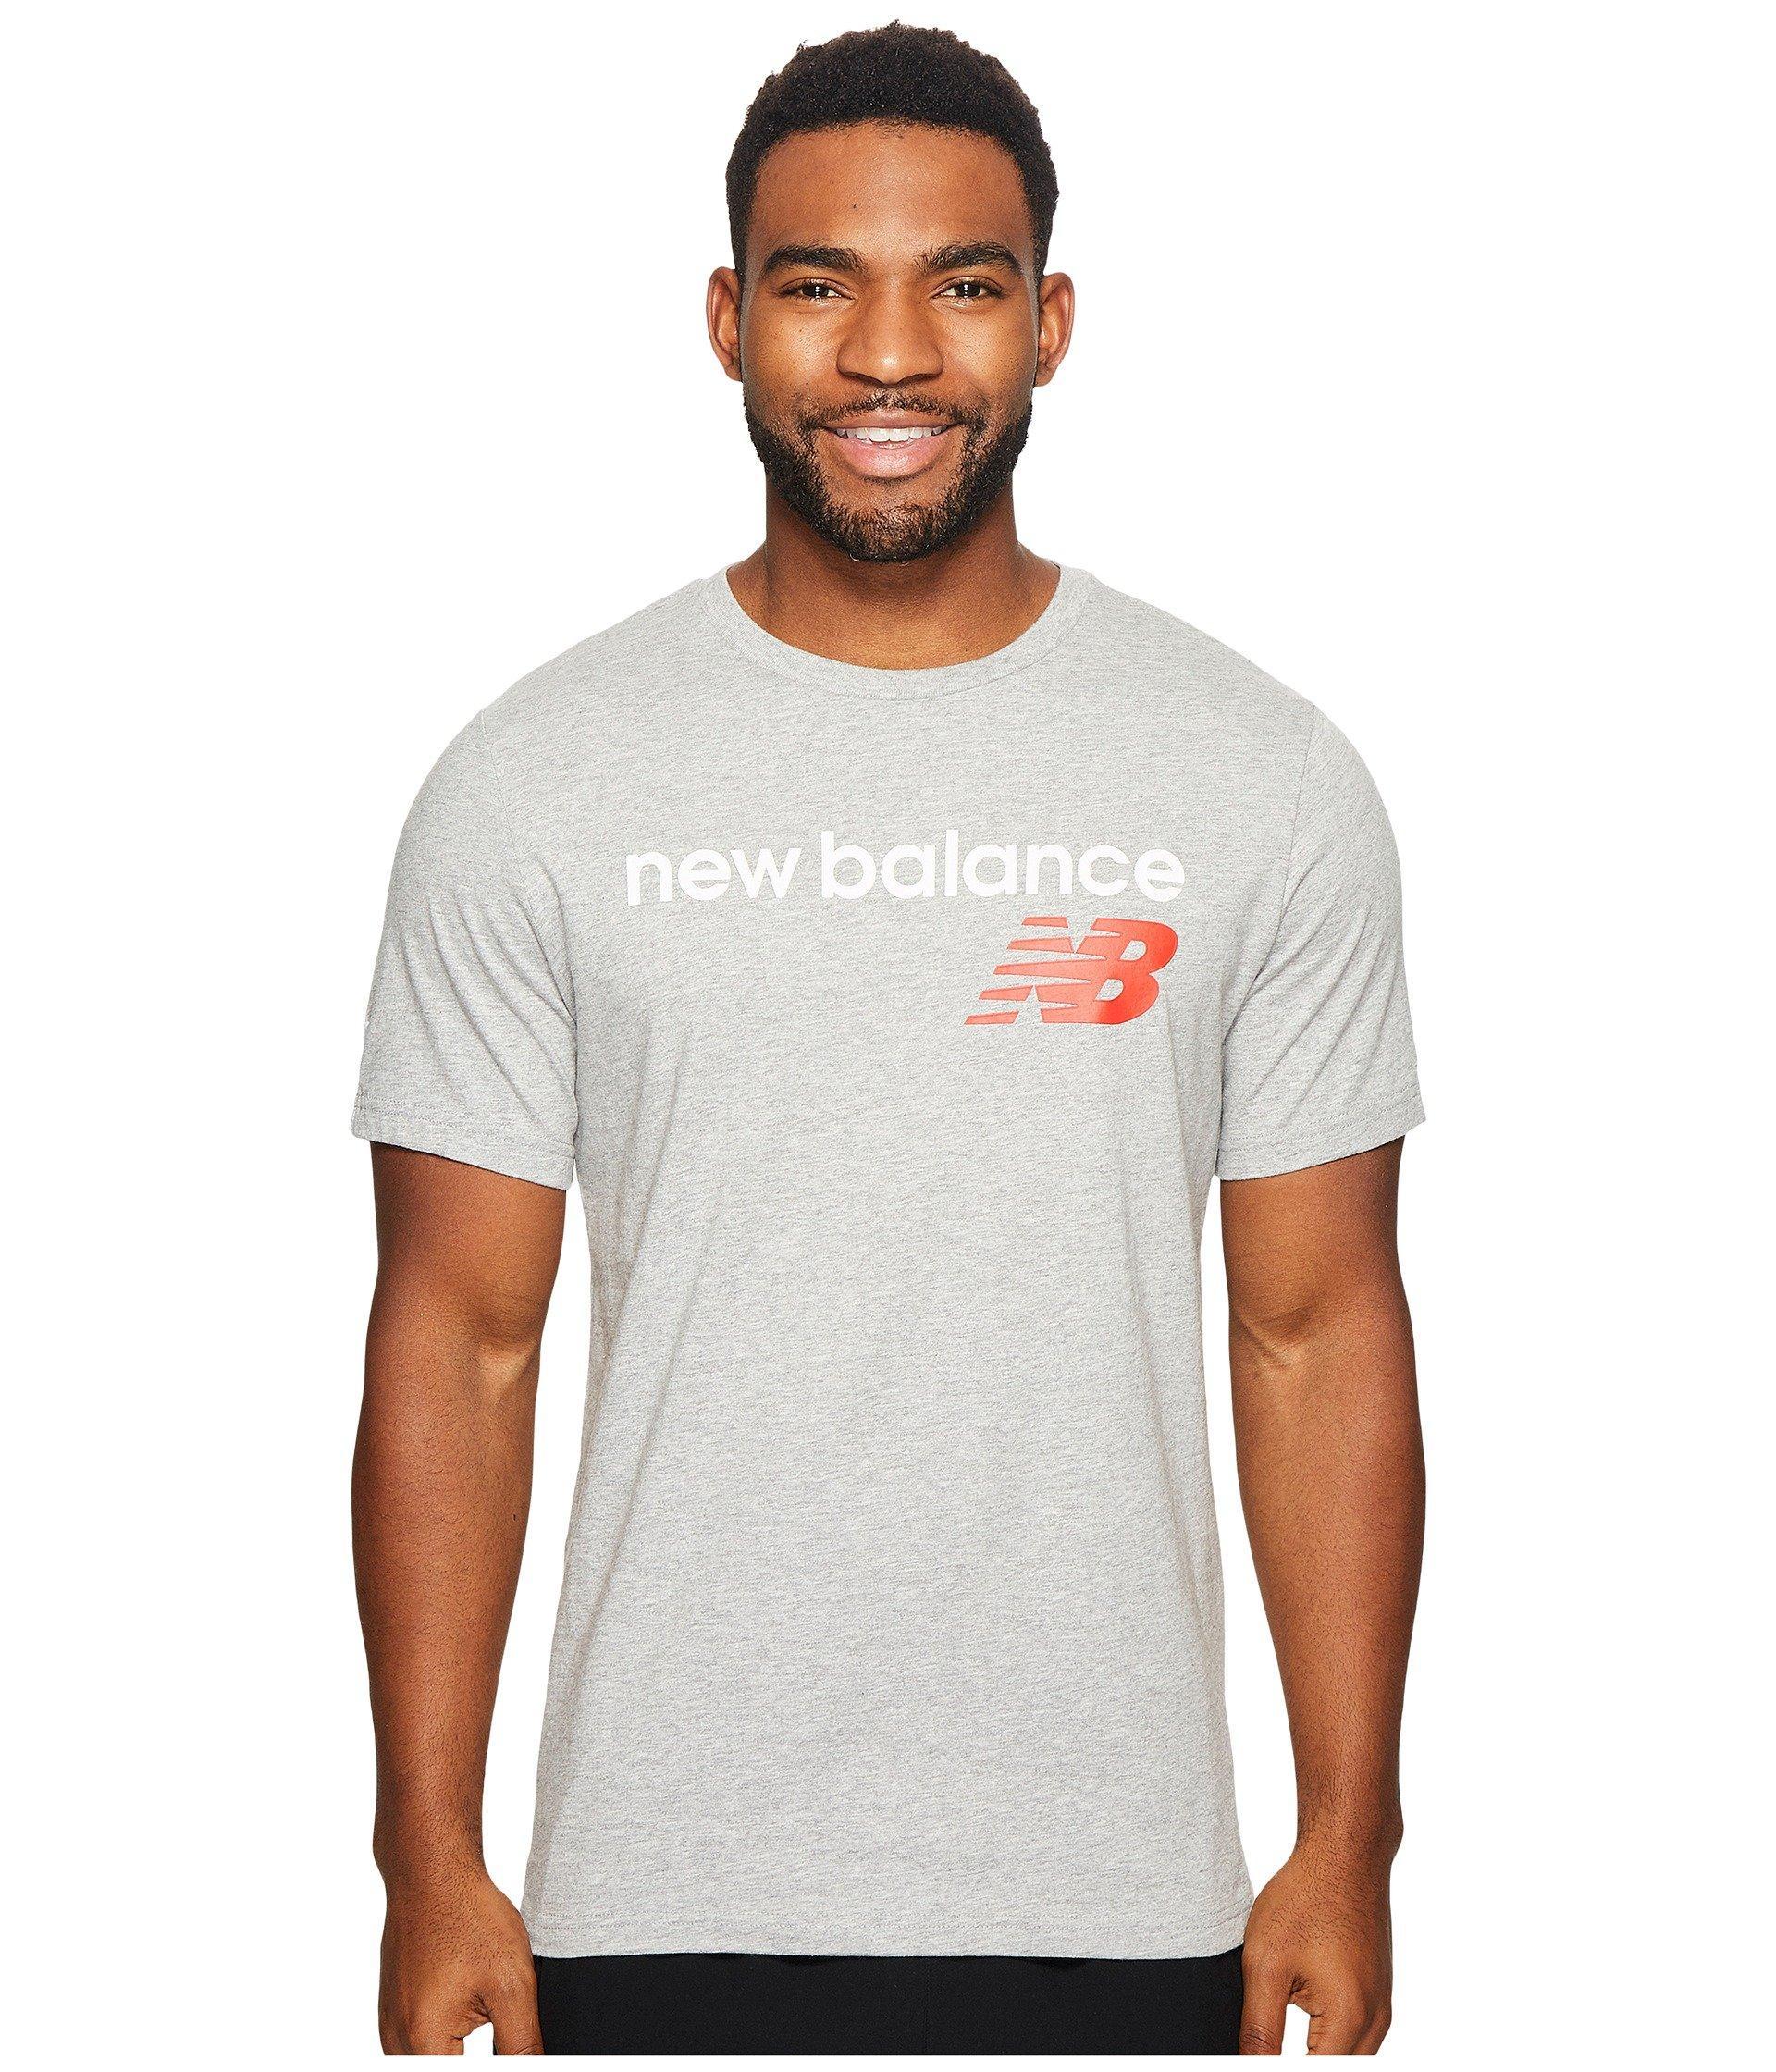 New Balance Nb Athletics Main Logo Tee In Athletic Grey